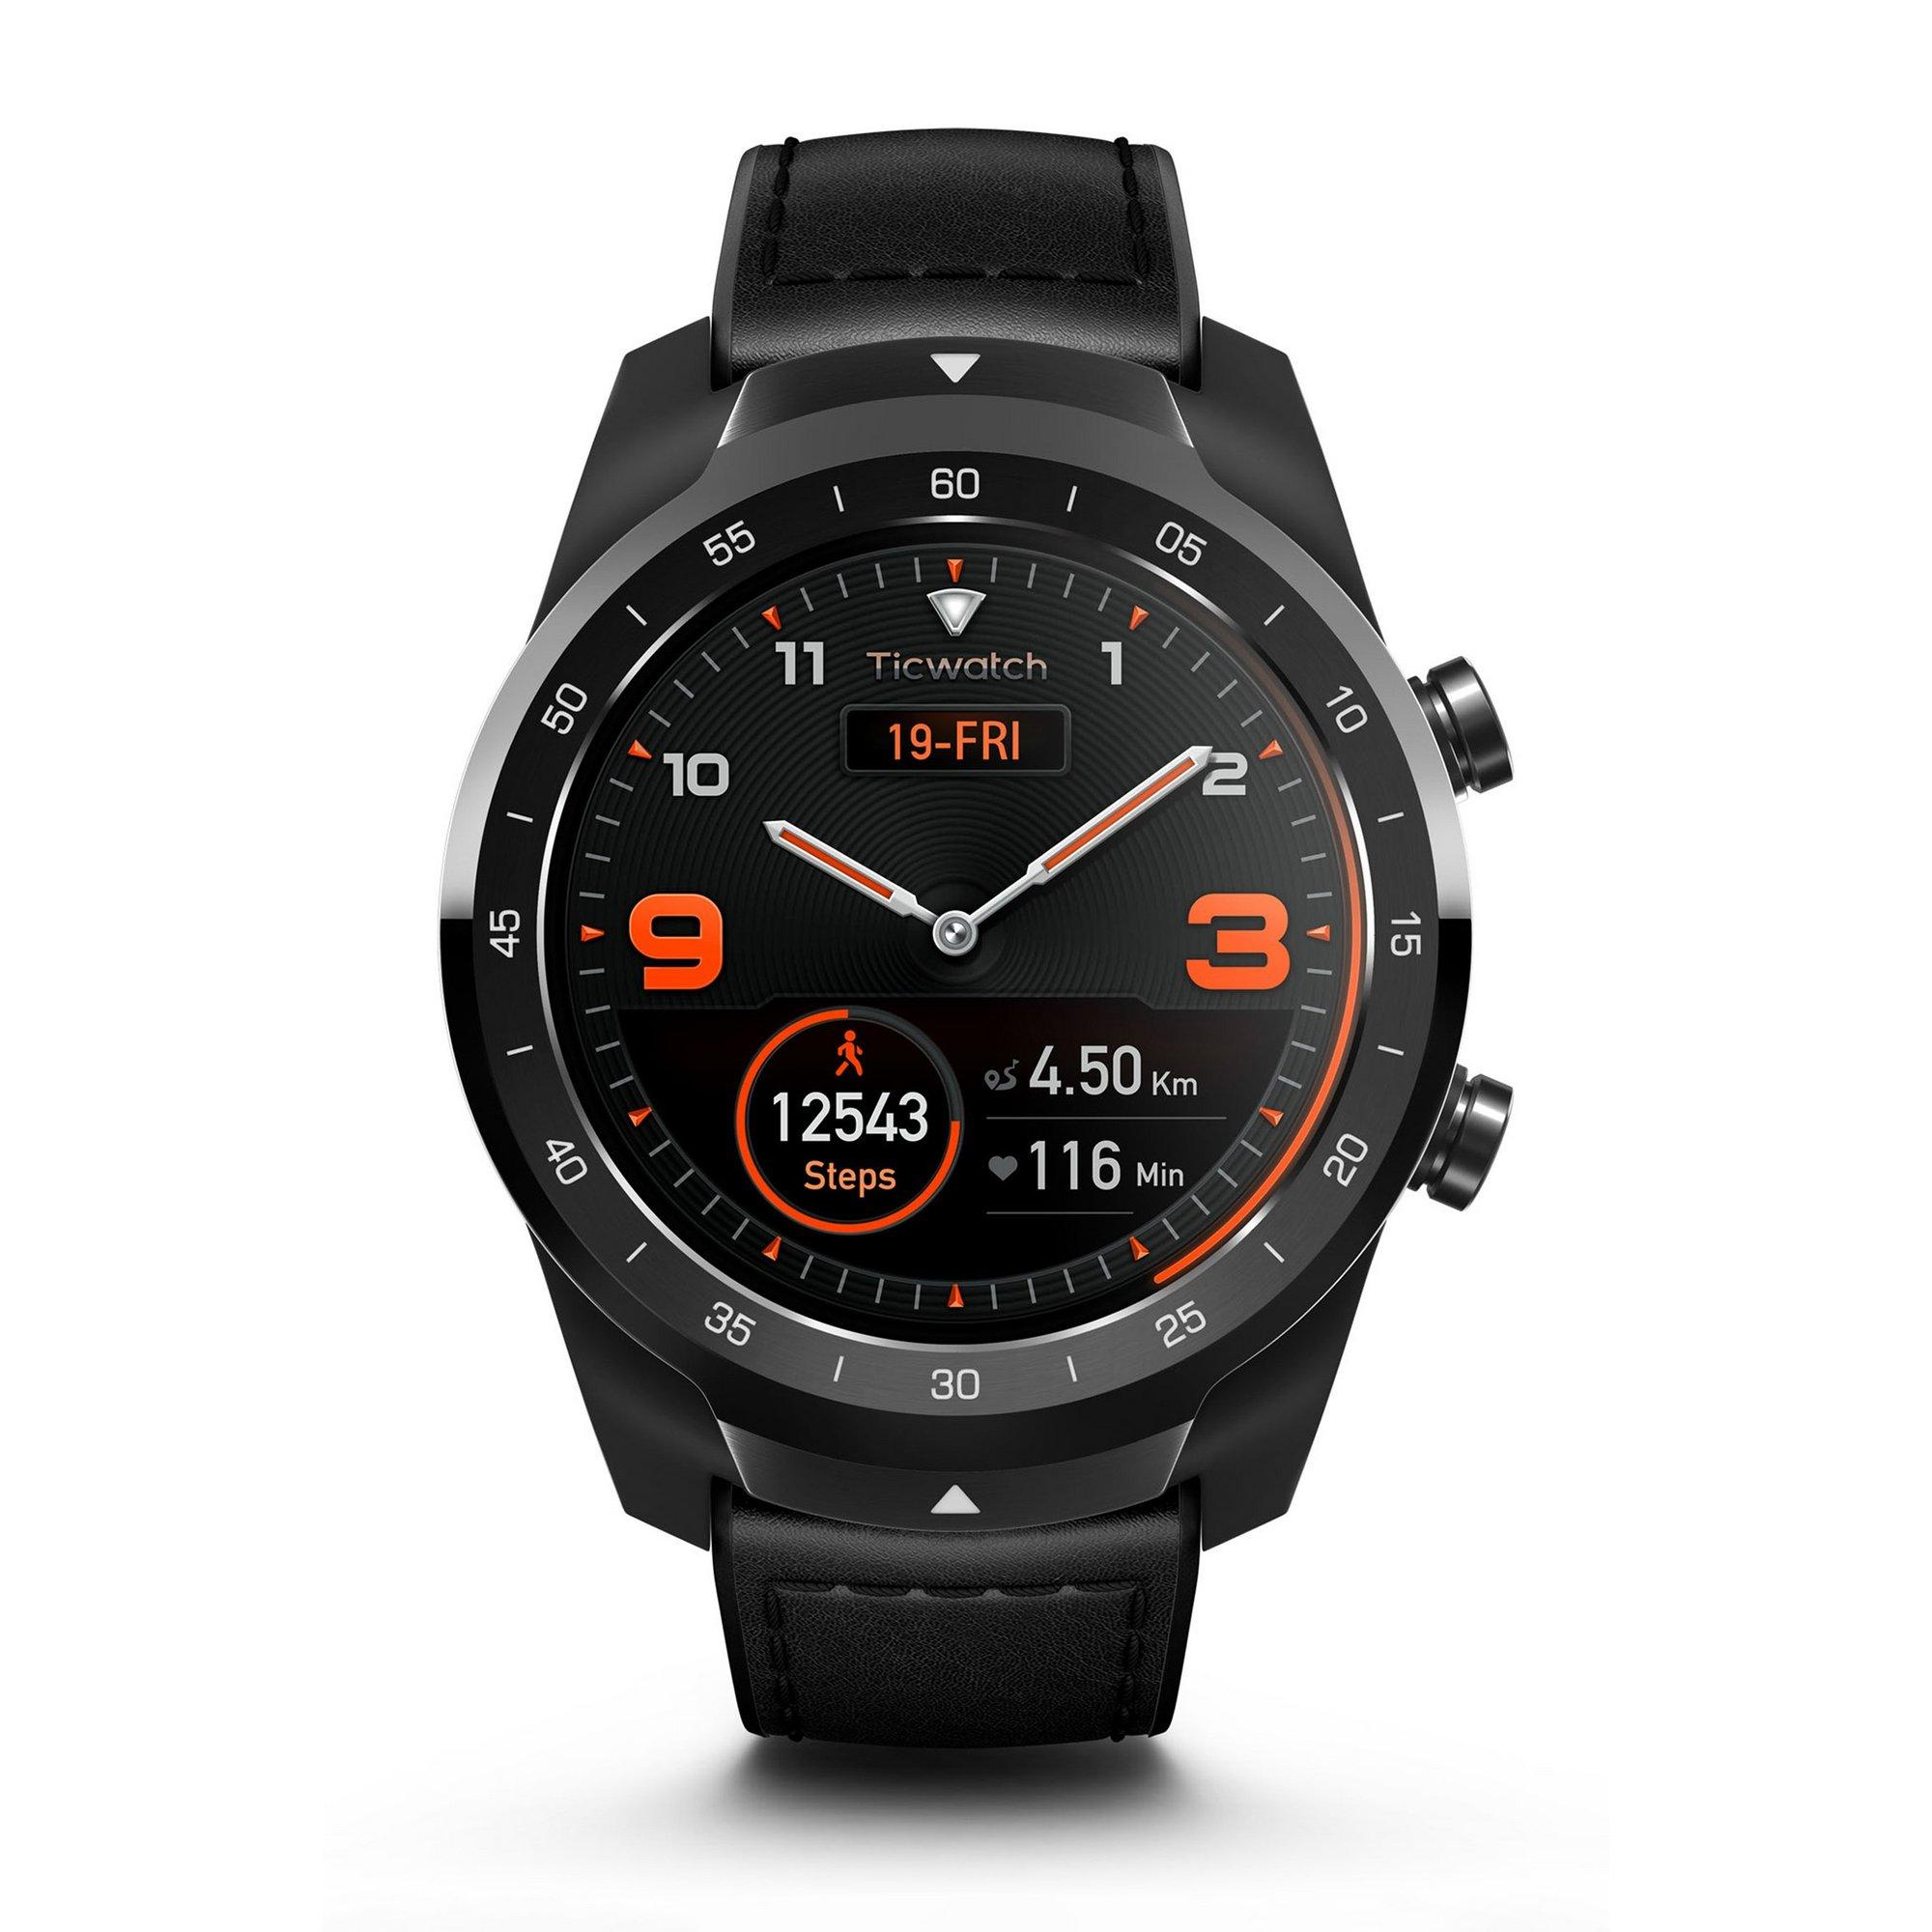 Image of TicWatch Pro 2020 1GB RAM Smartwatch